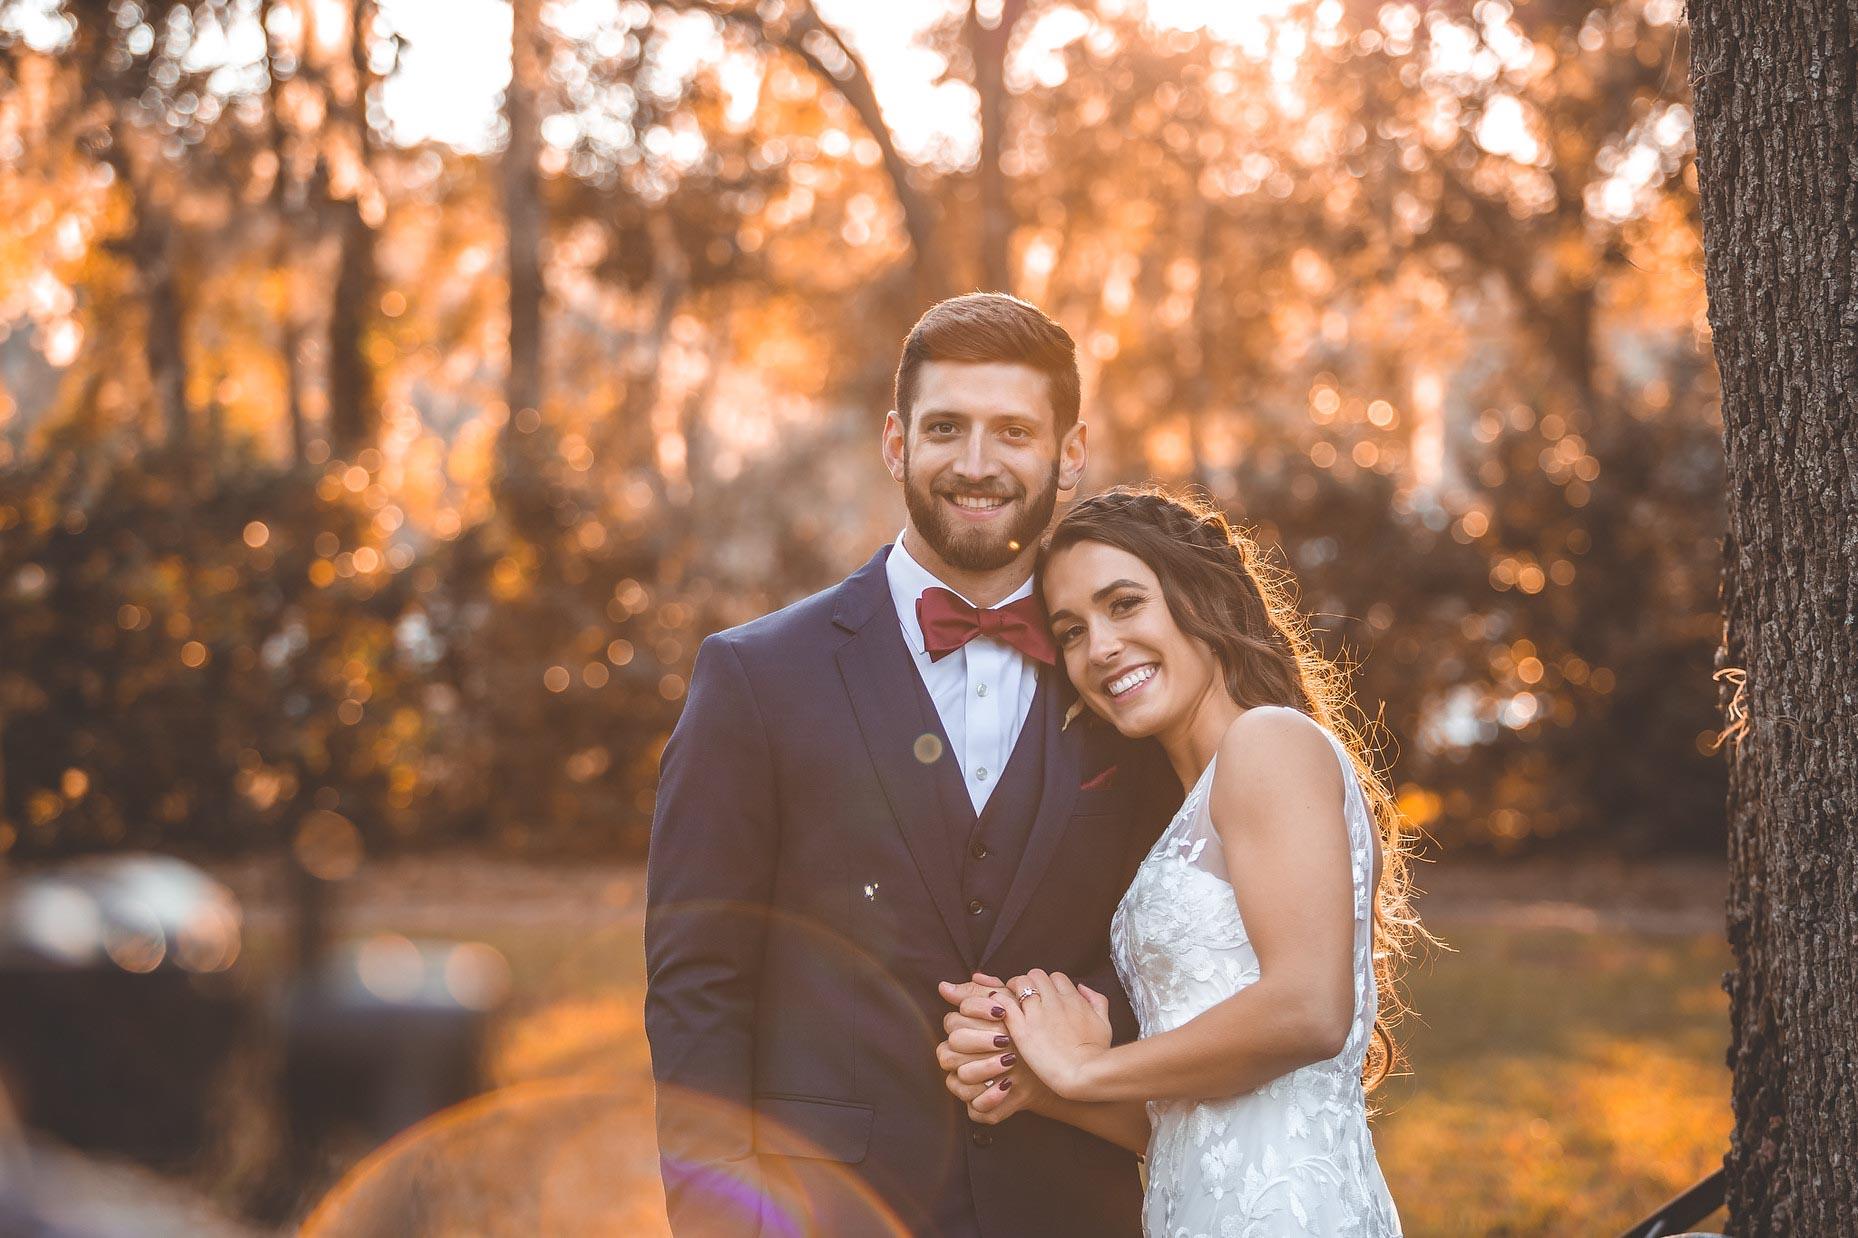 adam-szarmack-bowing-oaks-wedding-photographer-jacksonville-114.jpg